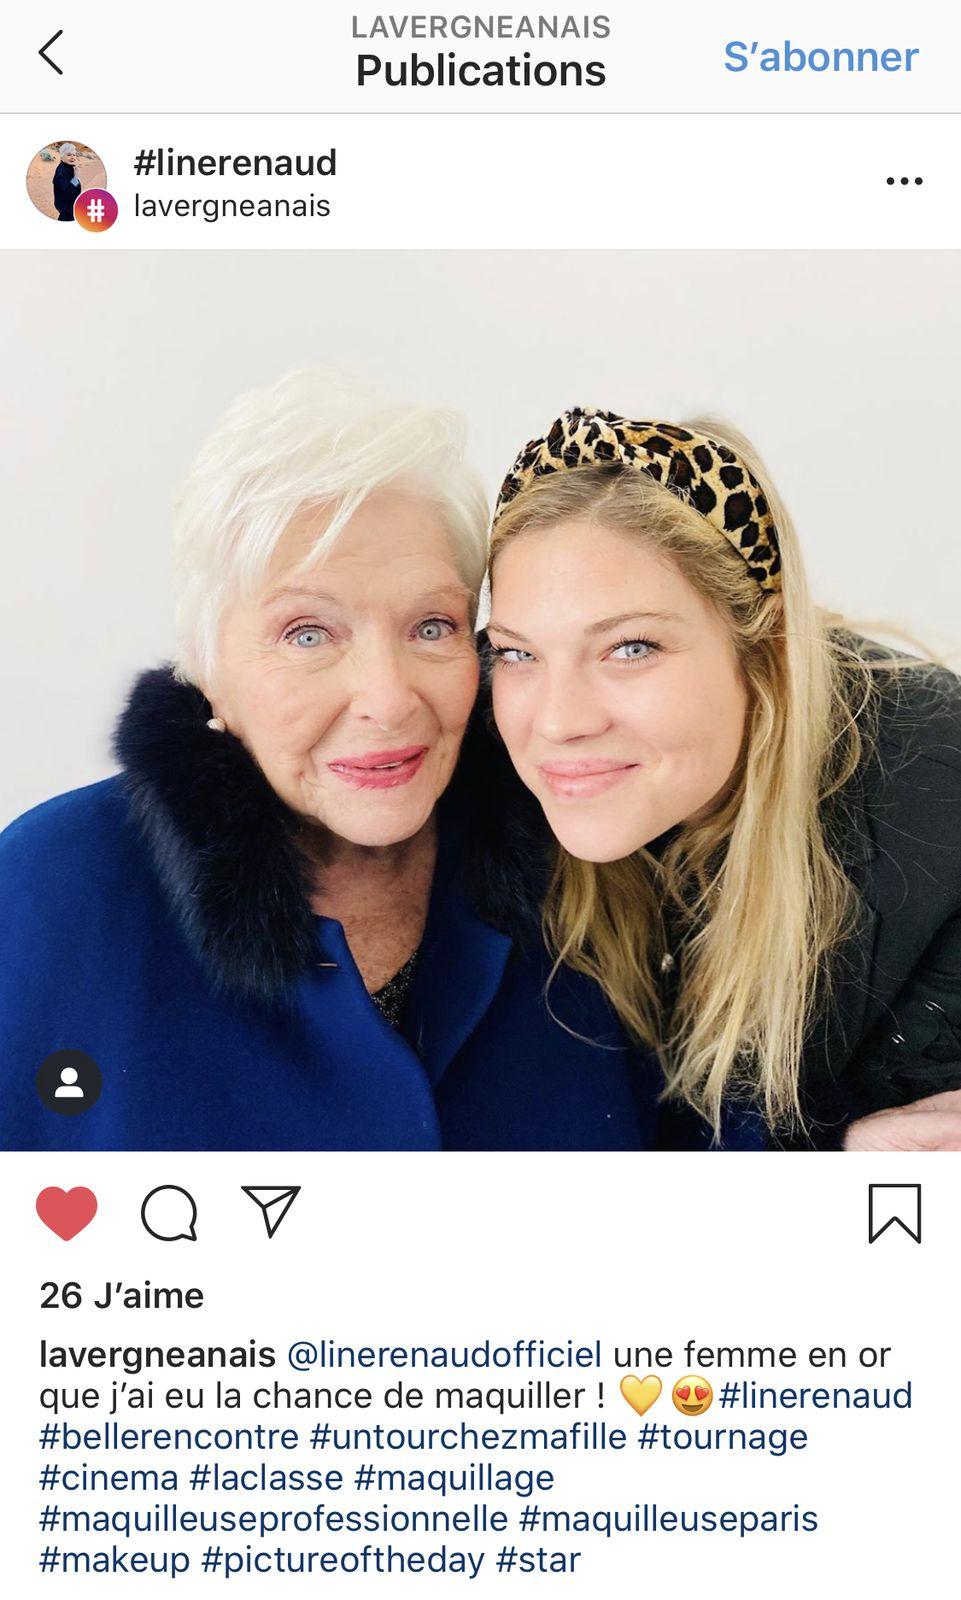 Instagram : https://www.instagram.com/lavergneanais